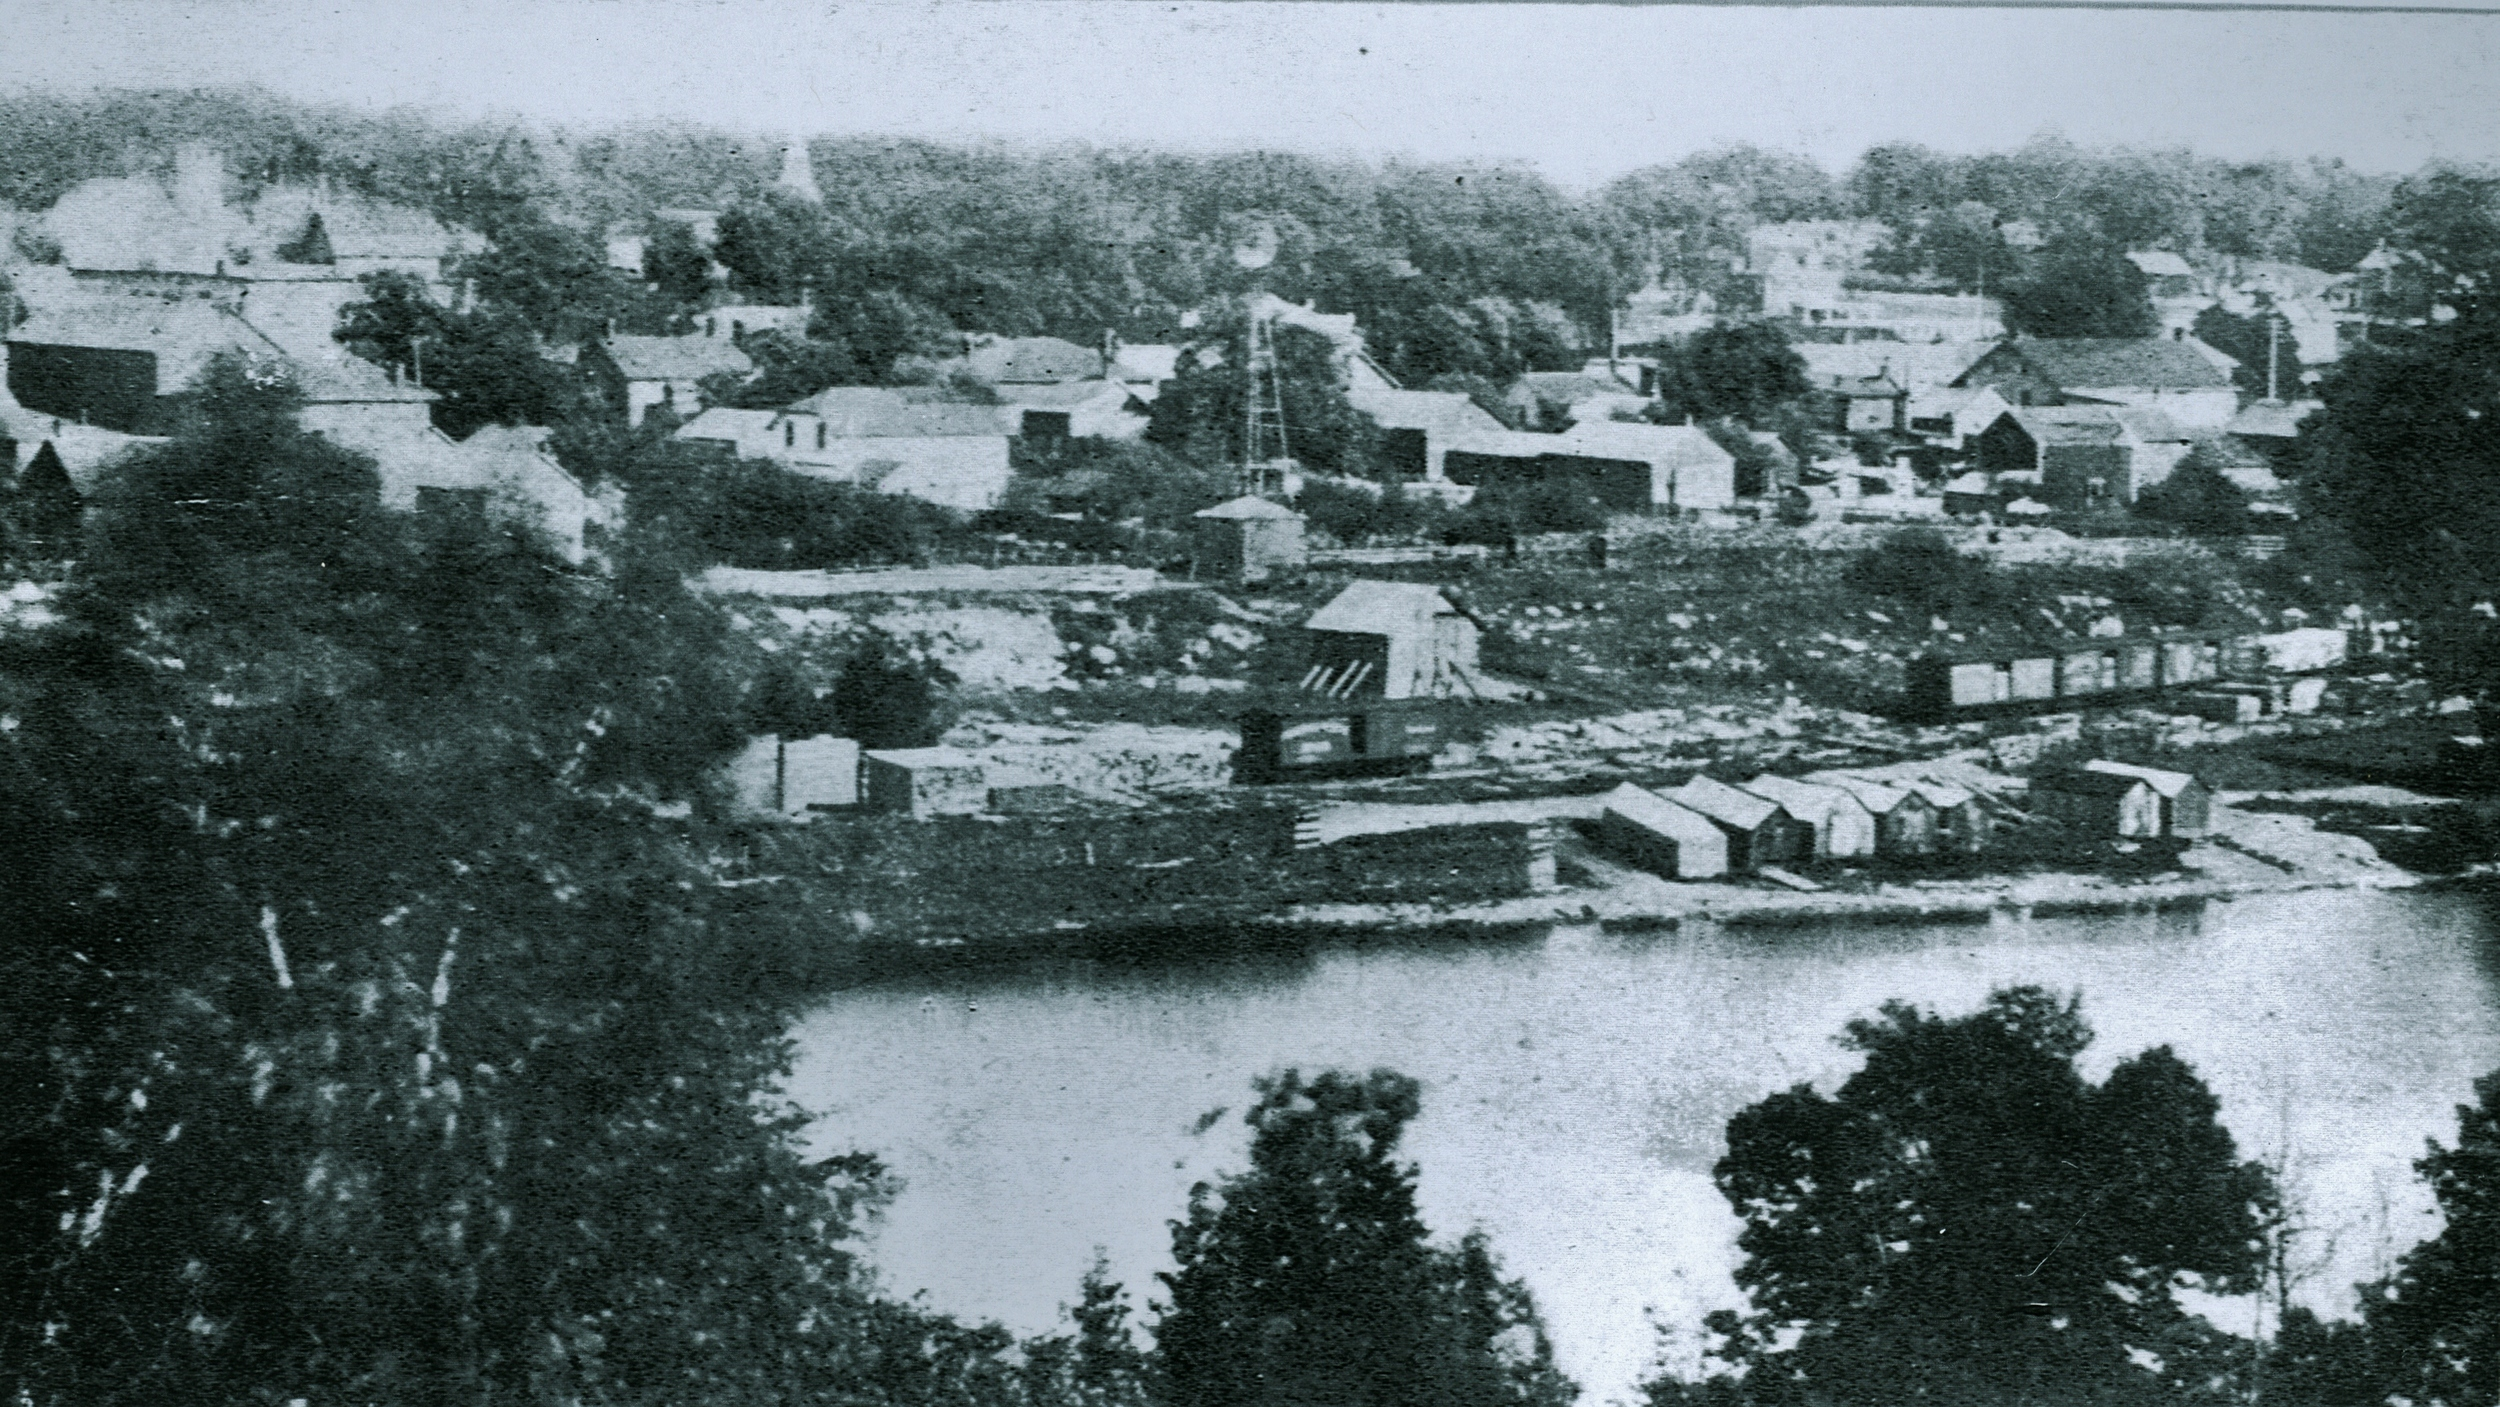 View of Marmora, looking east across Crowe River